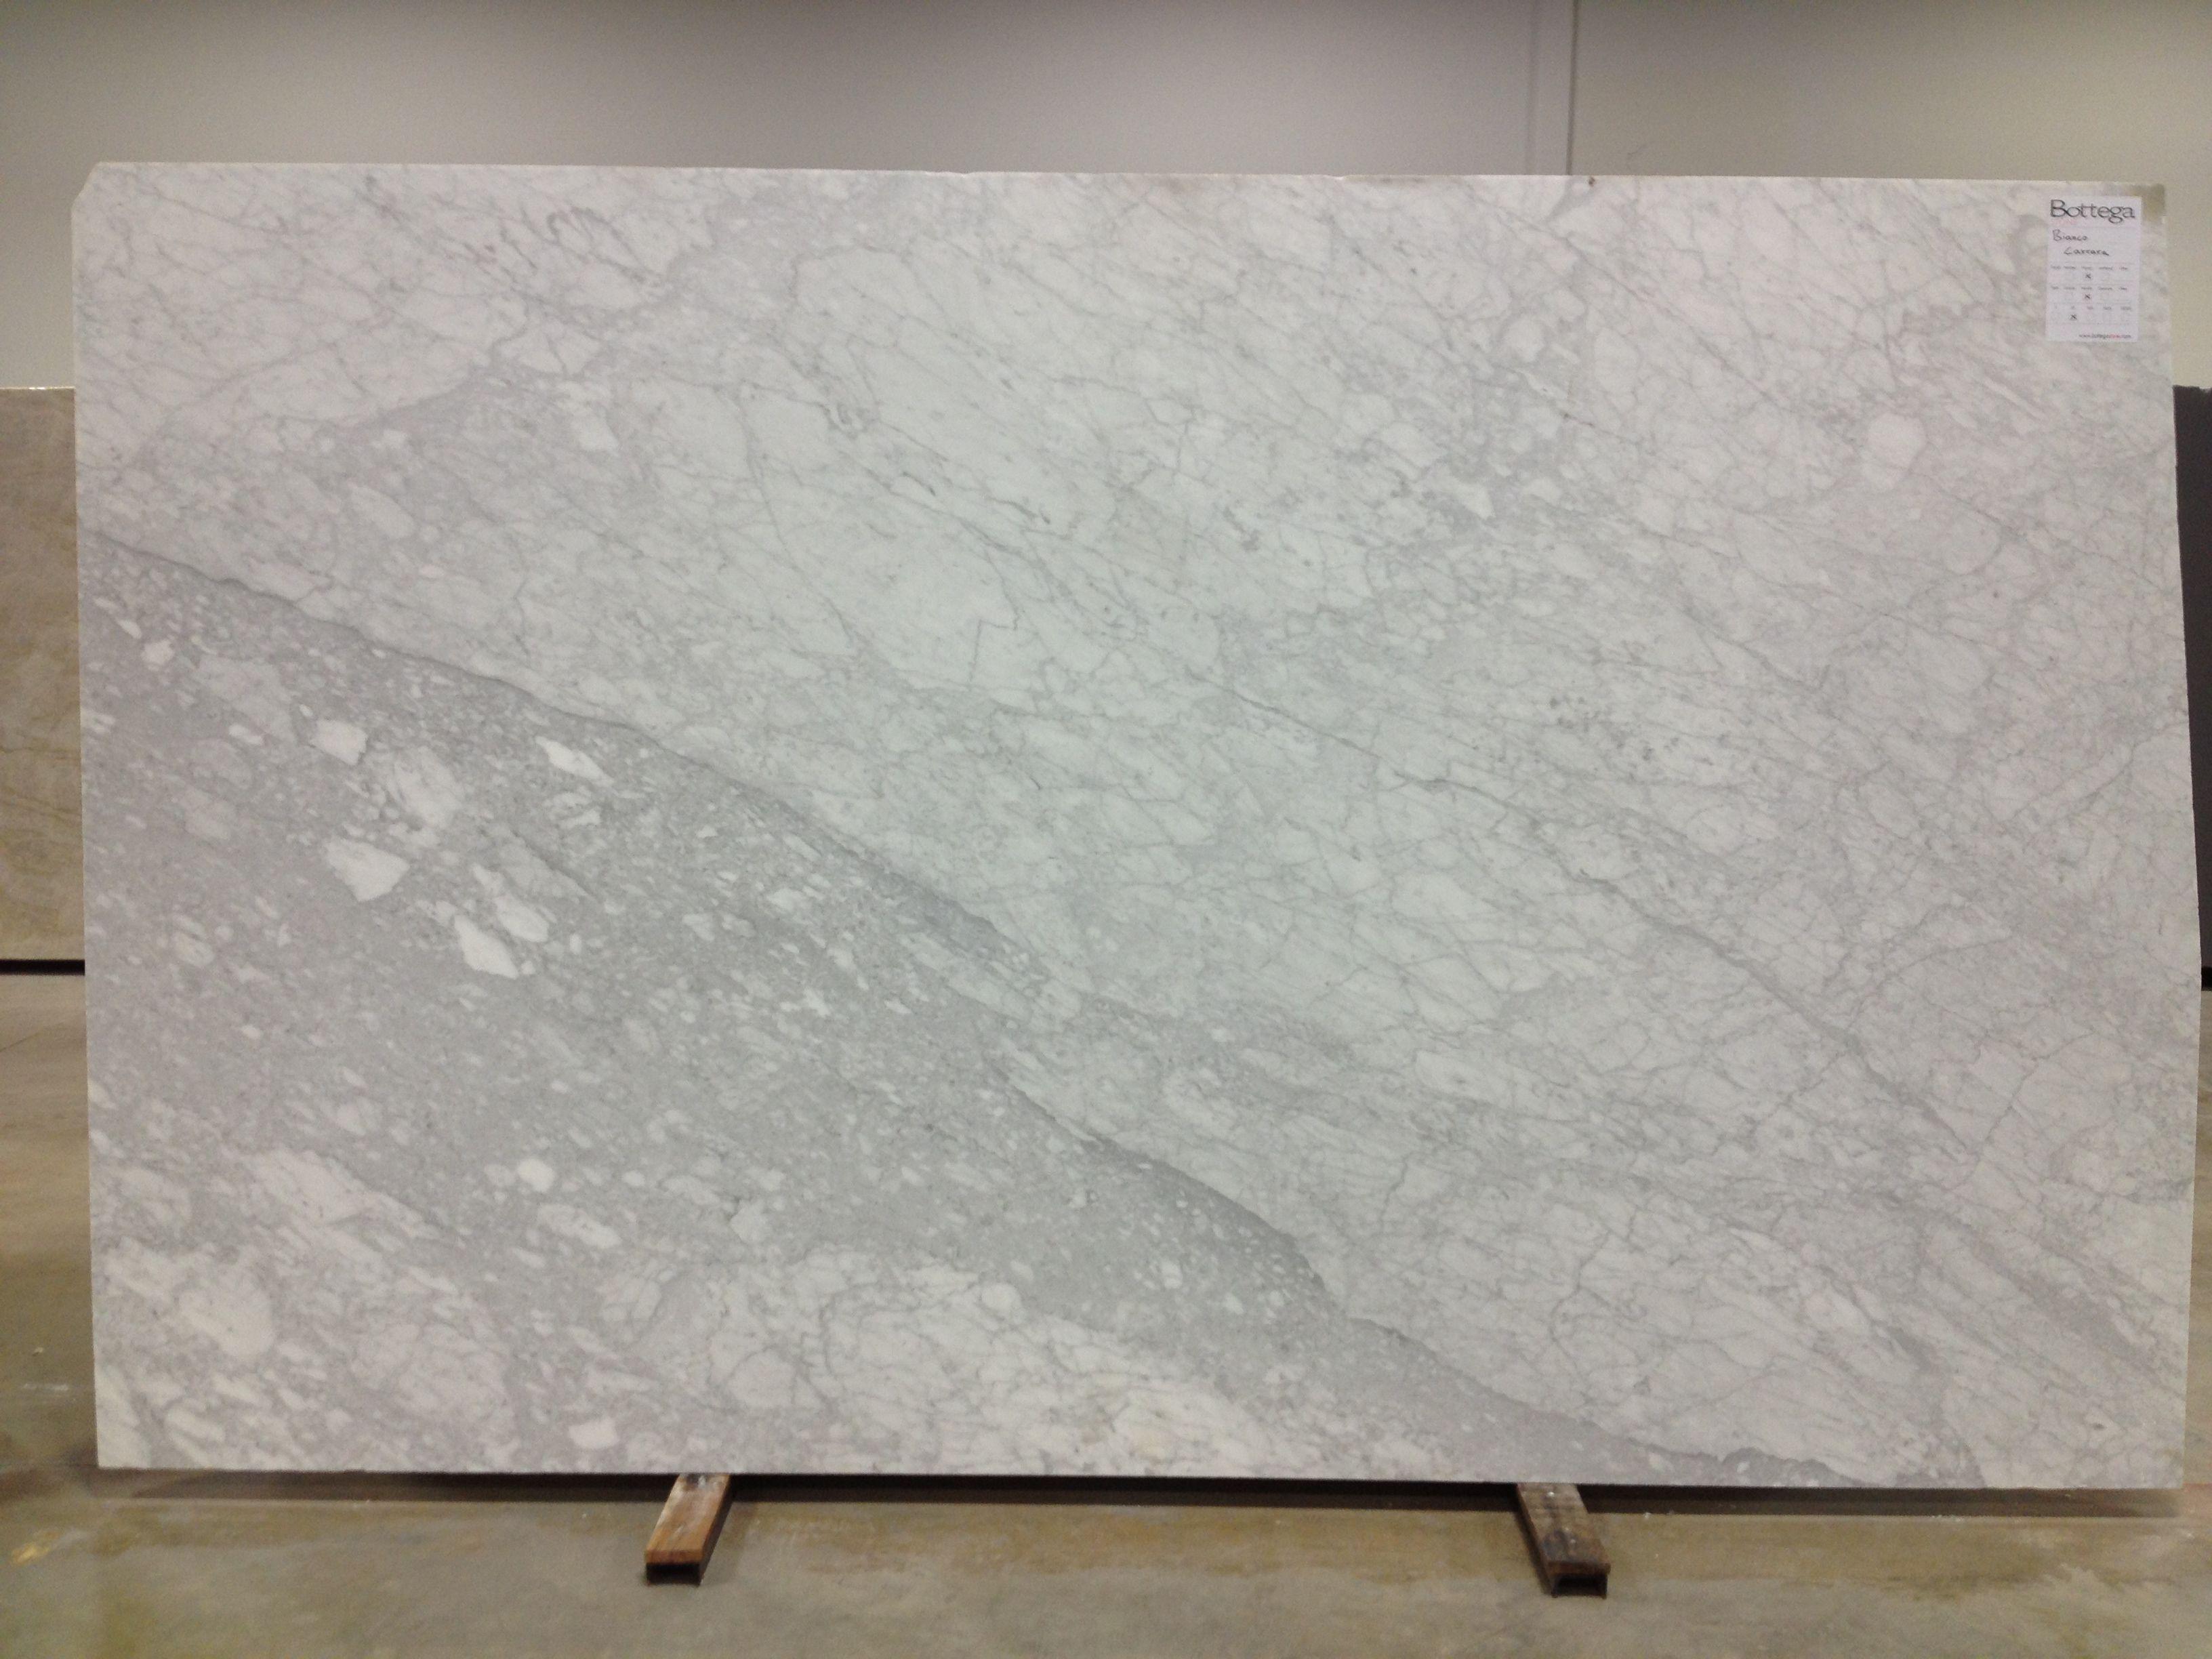 Bianco Carrara Marble | Marble Slabs | Carrara marble